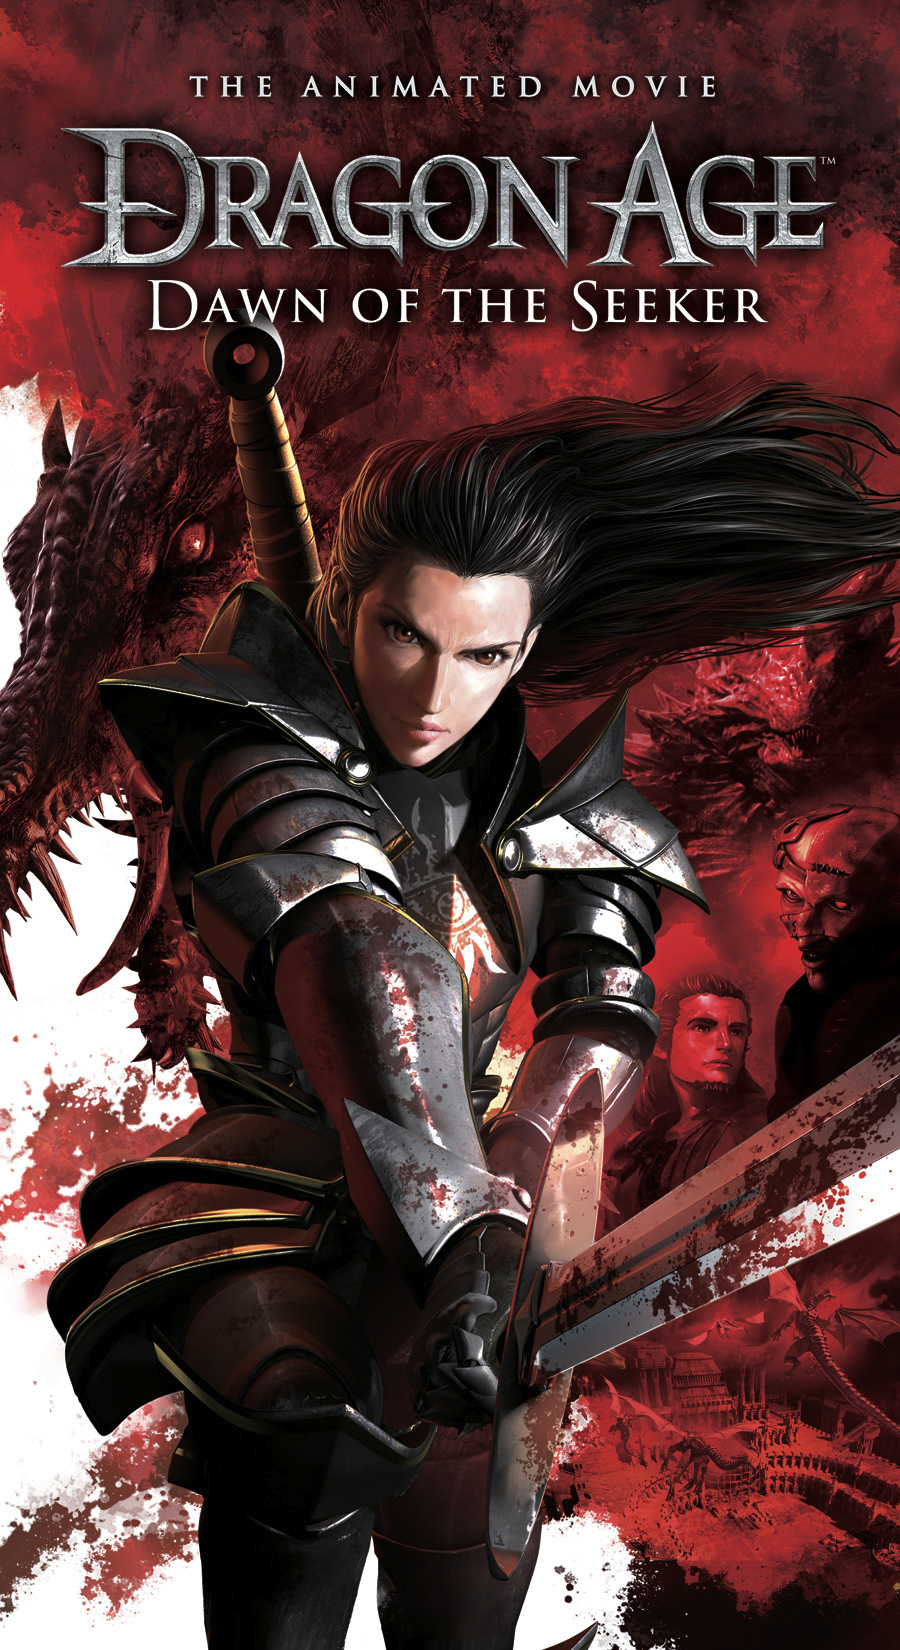 Dragon Age: Dawn of the Seeker (2011)